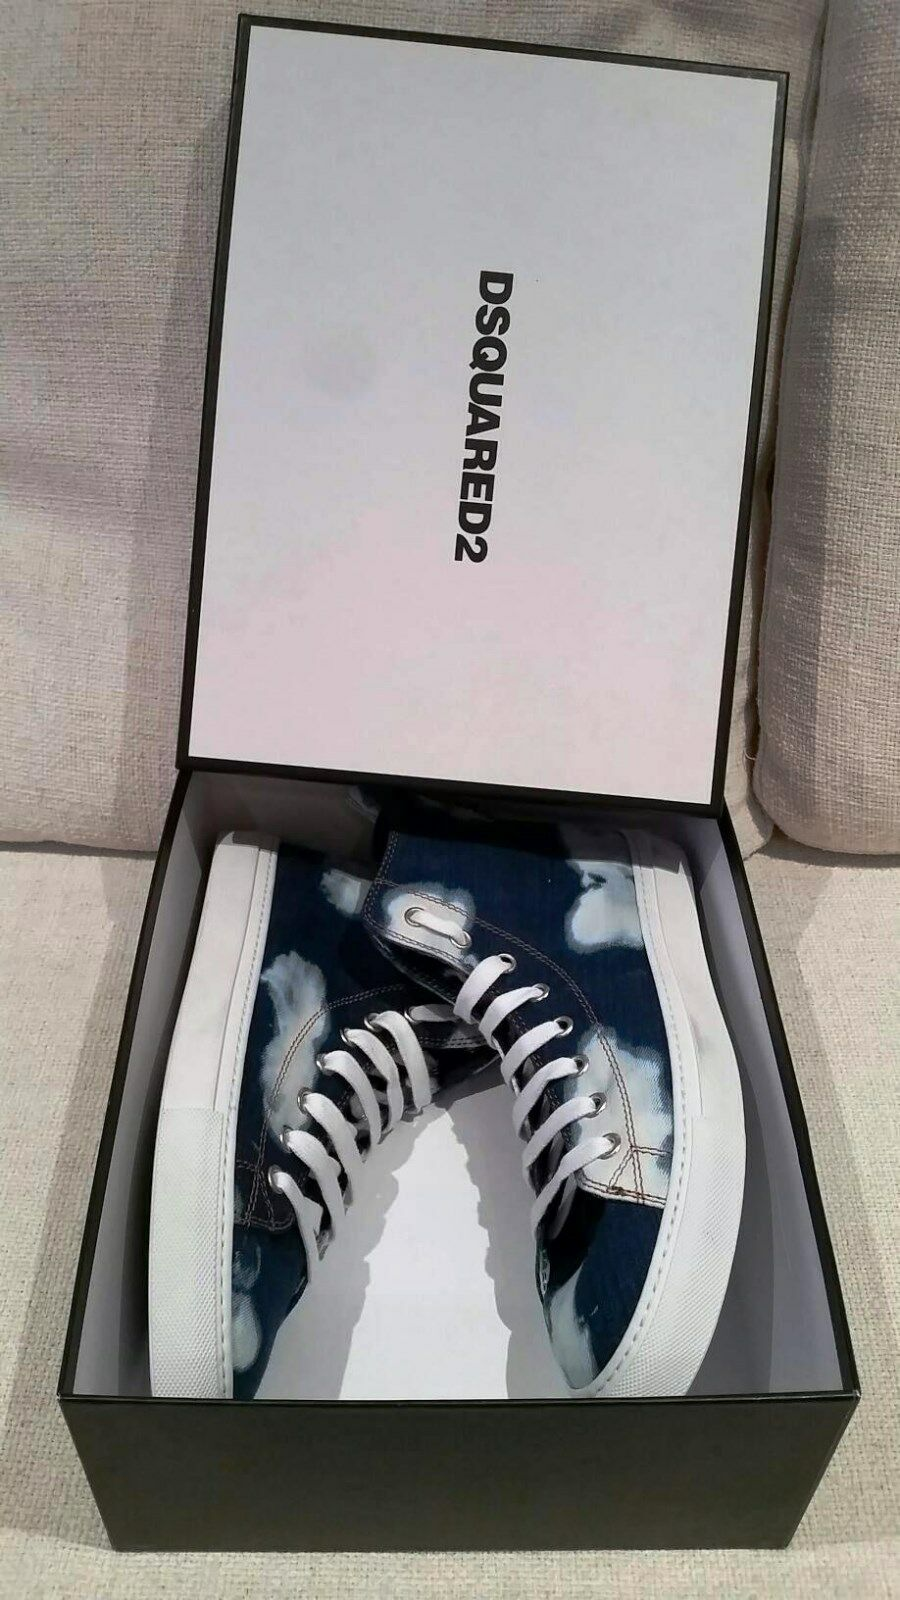 650 DSQUARED2 High Top BLEACHED Denim Lavato BASQUETTES lace SNEAKERS Shoes 44